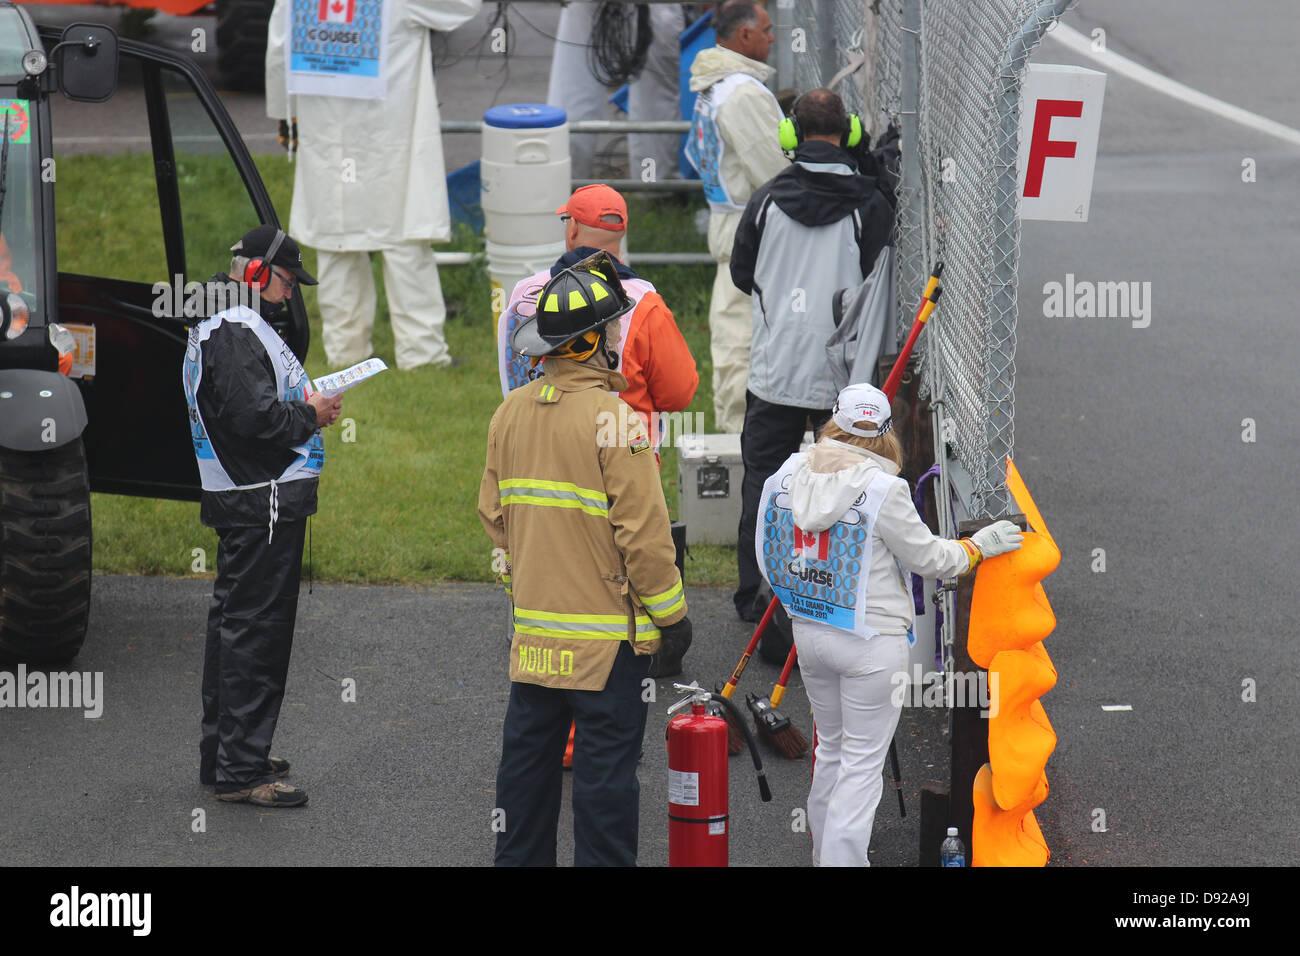 Emergency track crew at Montreal Grand Prix Stock Photo